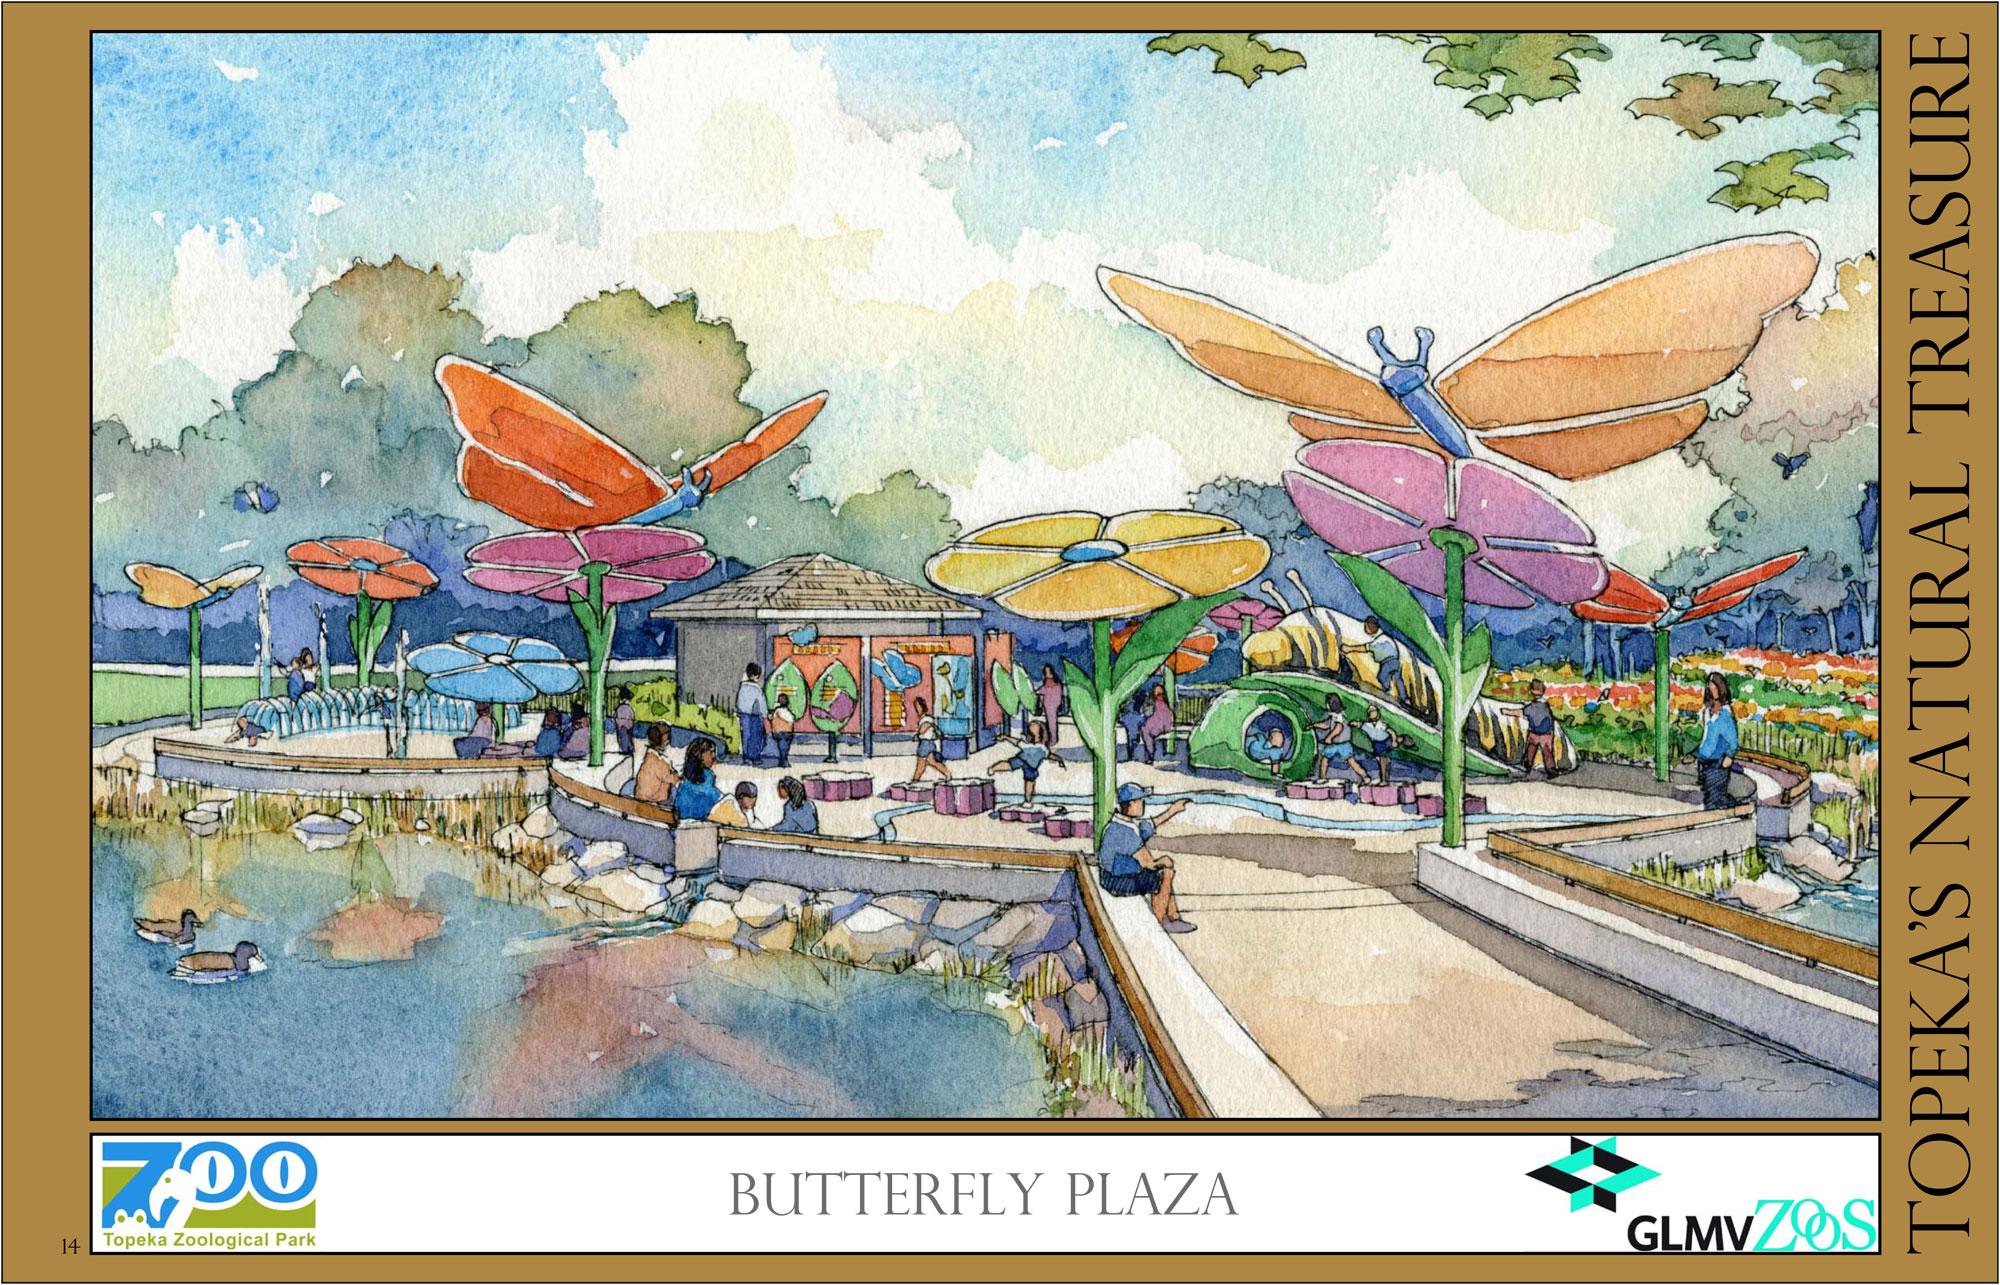 Butterfly Plaza